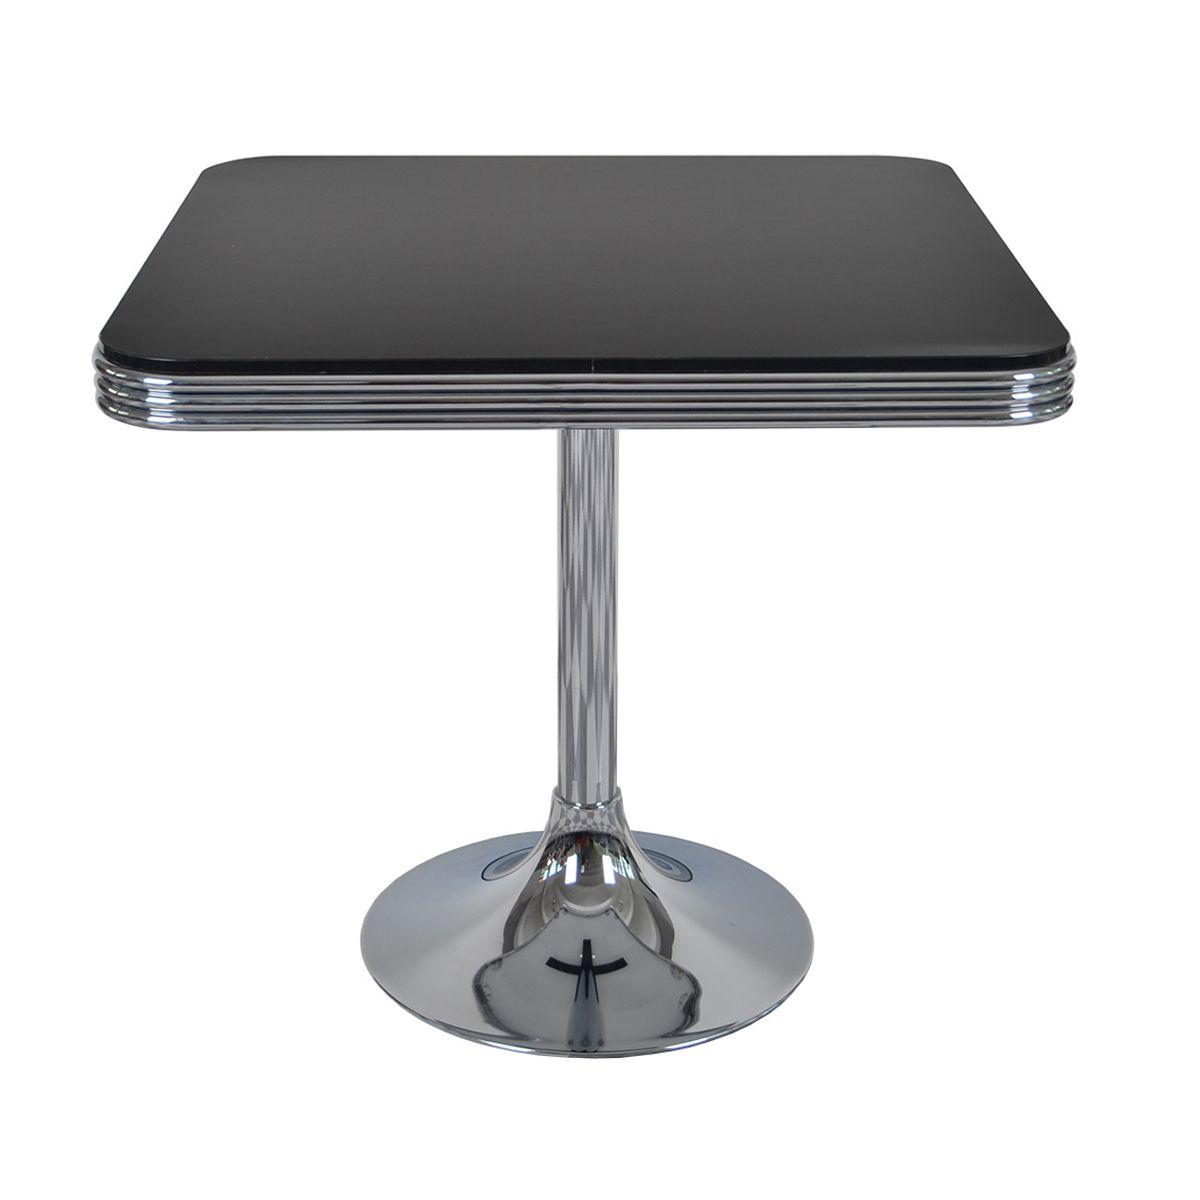 Dinertische Diner Table Restaurant Retro Table Fast